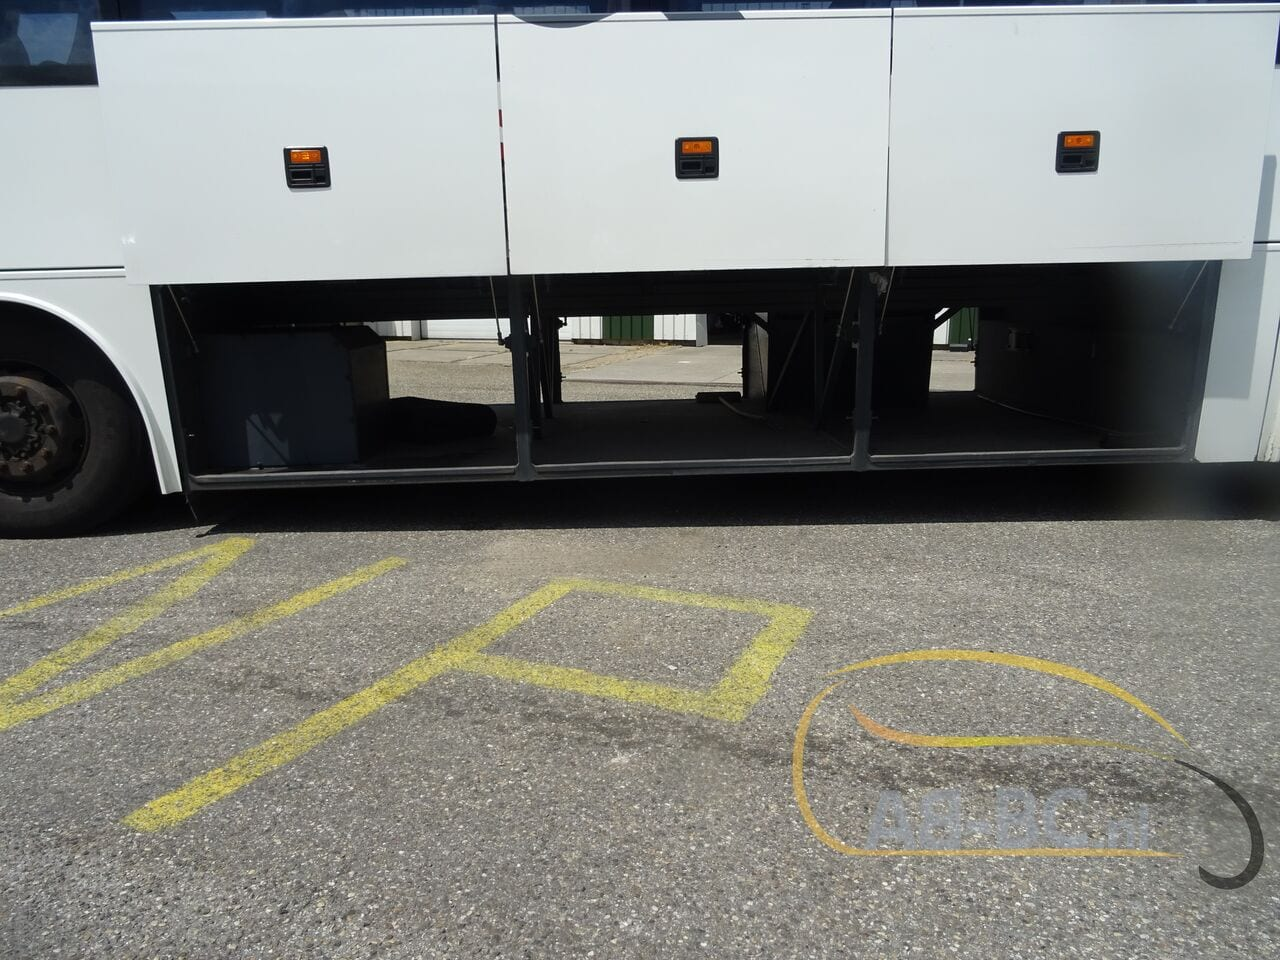 coach-busTEMSA-Safari-RD-DAF-Motor-53-Seats-Euro-5---1623932657454594038_big_fed57ad4b7751e35495c542b8983a575--21061715155620919600